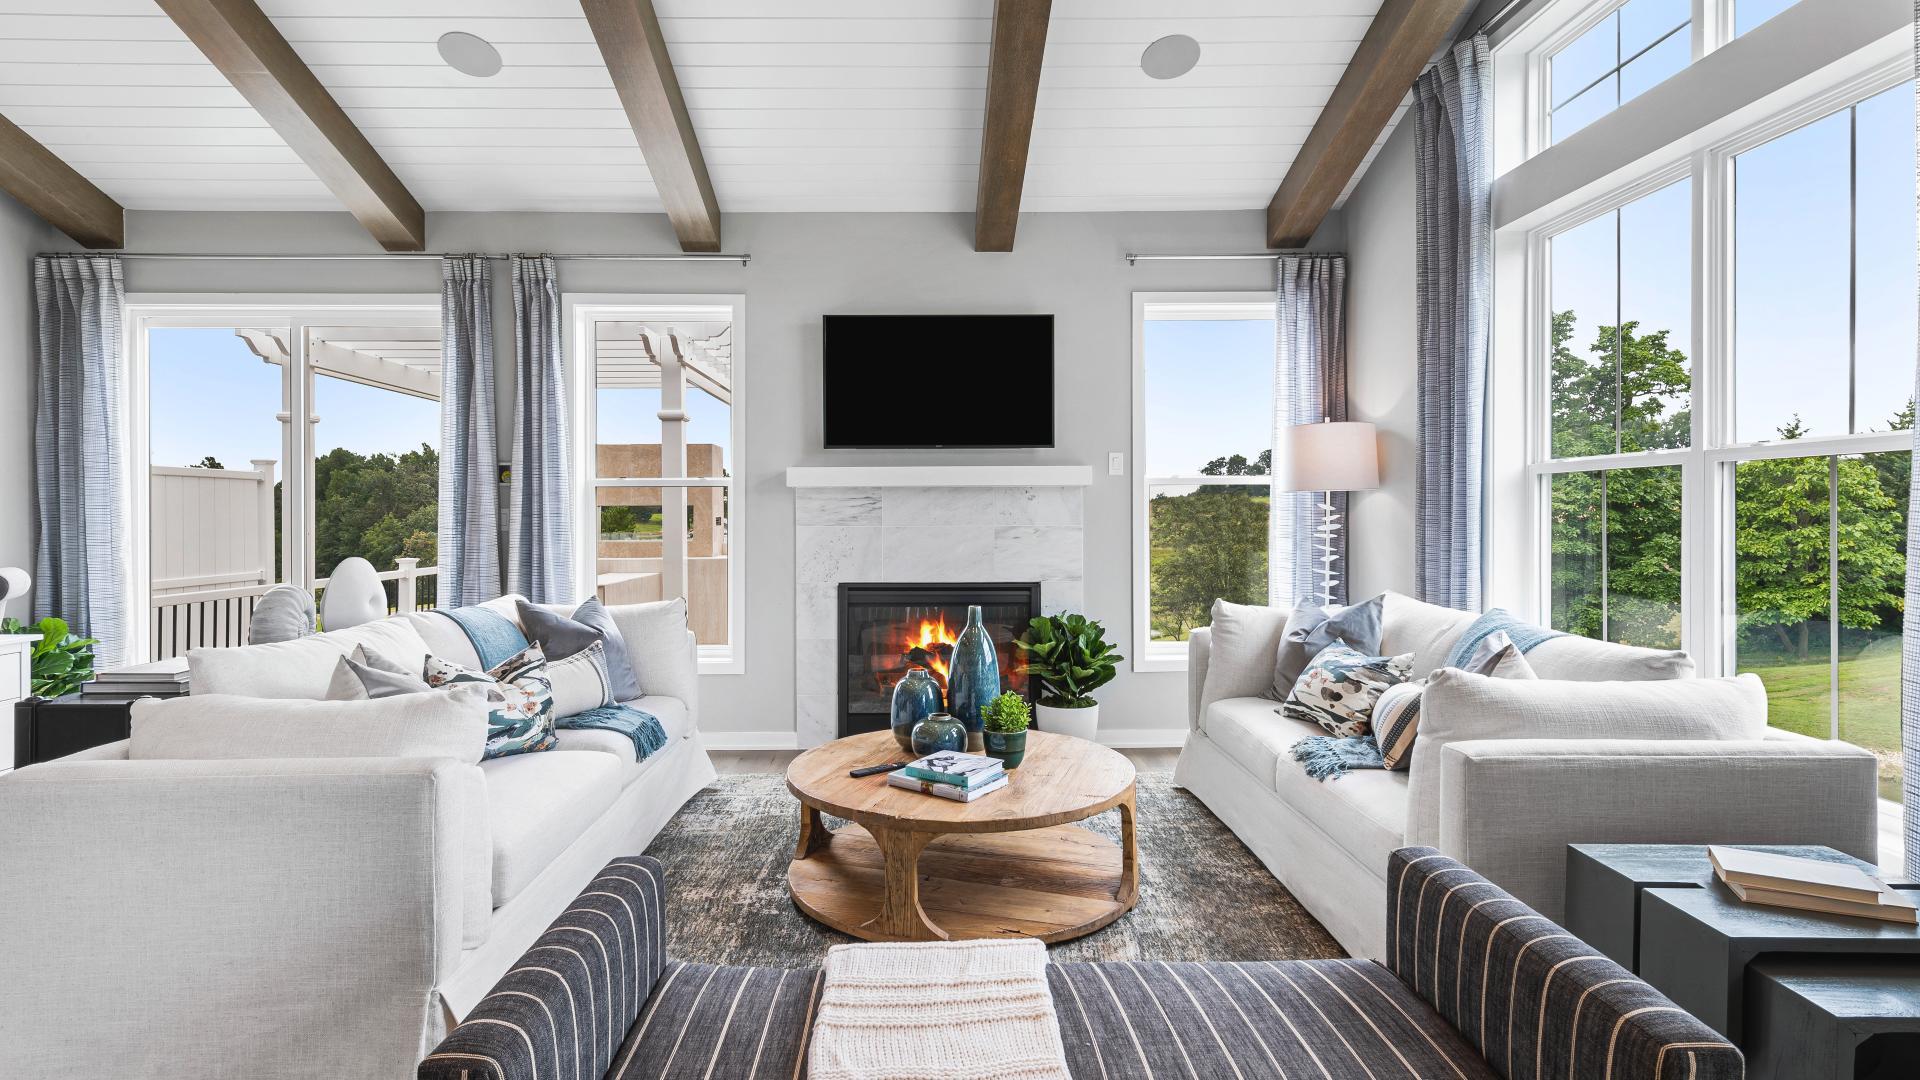 Stunning new home designs - Representative photo